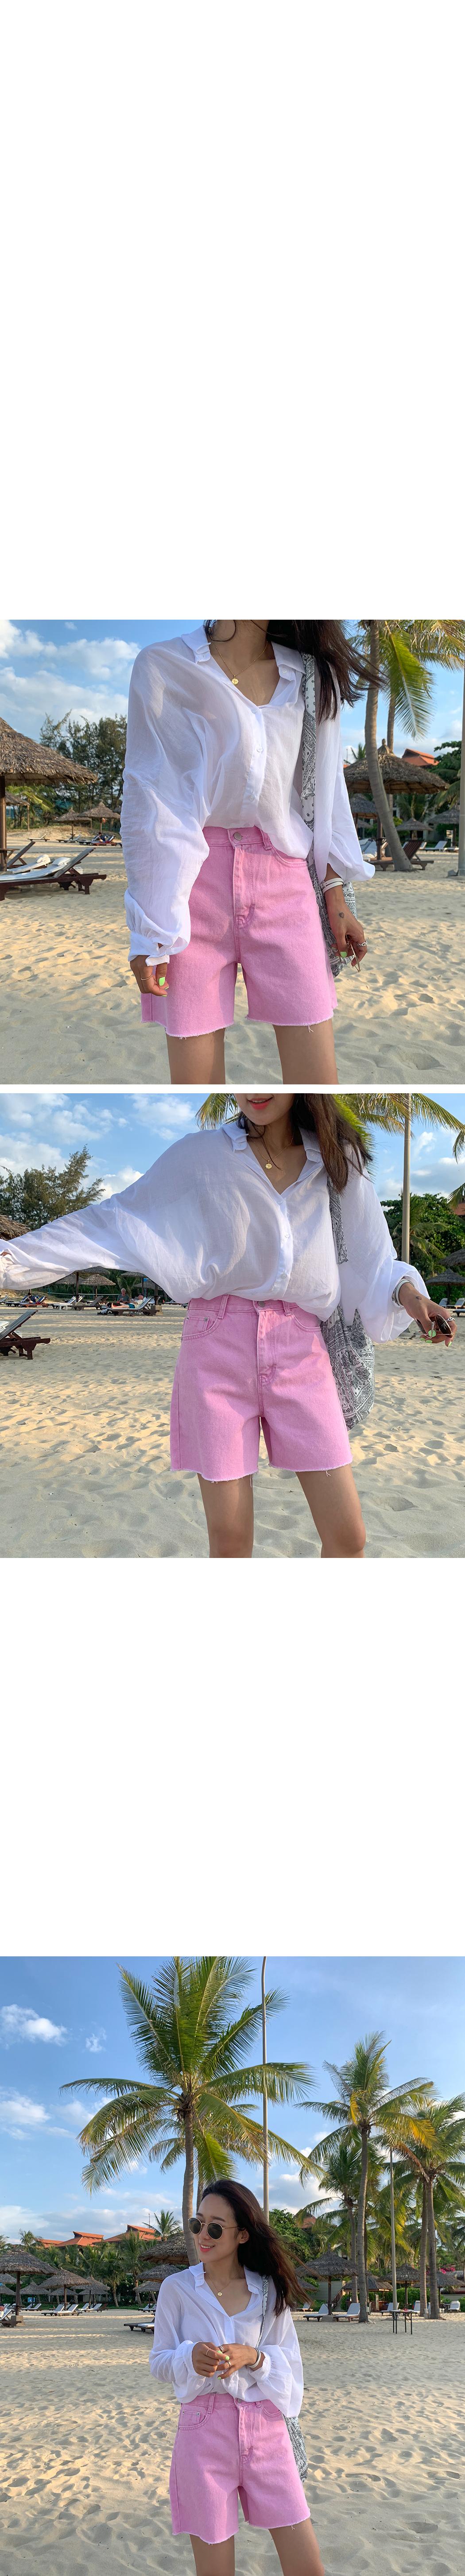 Sunset Beach Asa Blouse